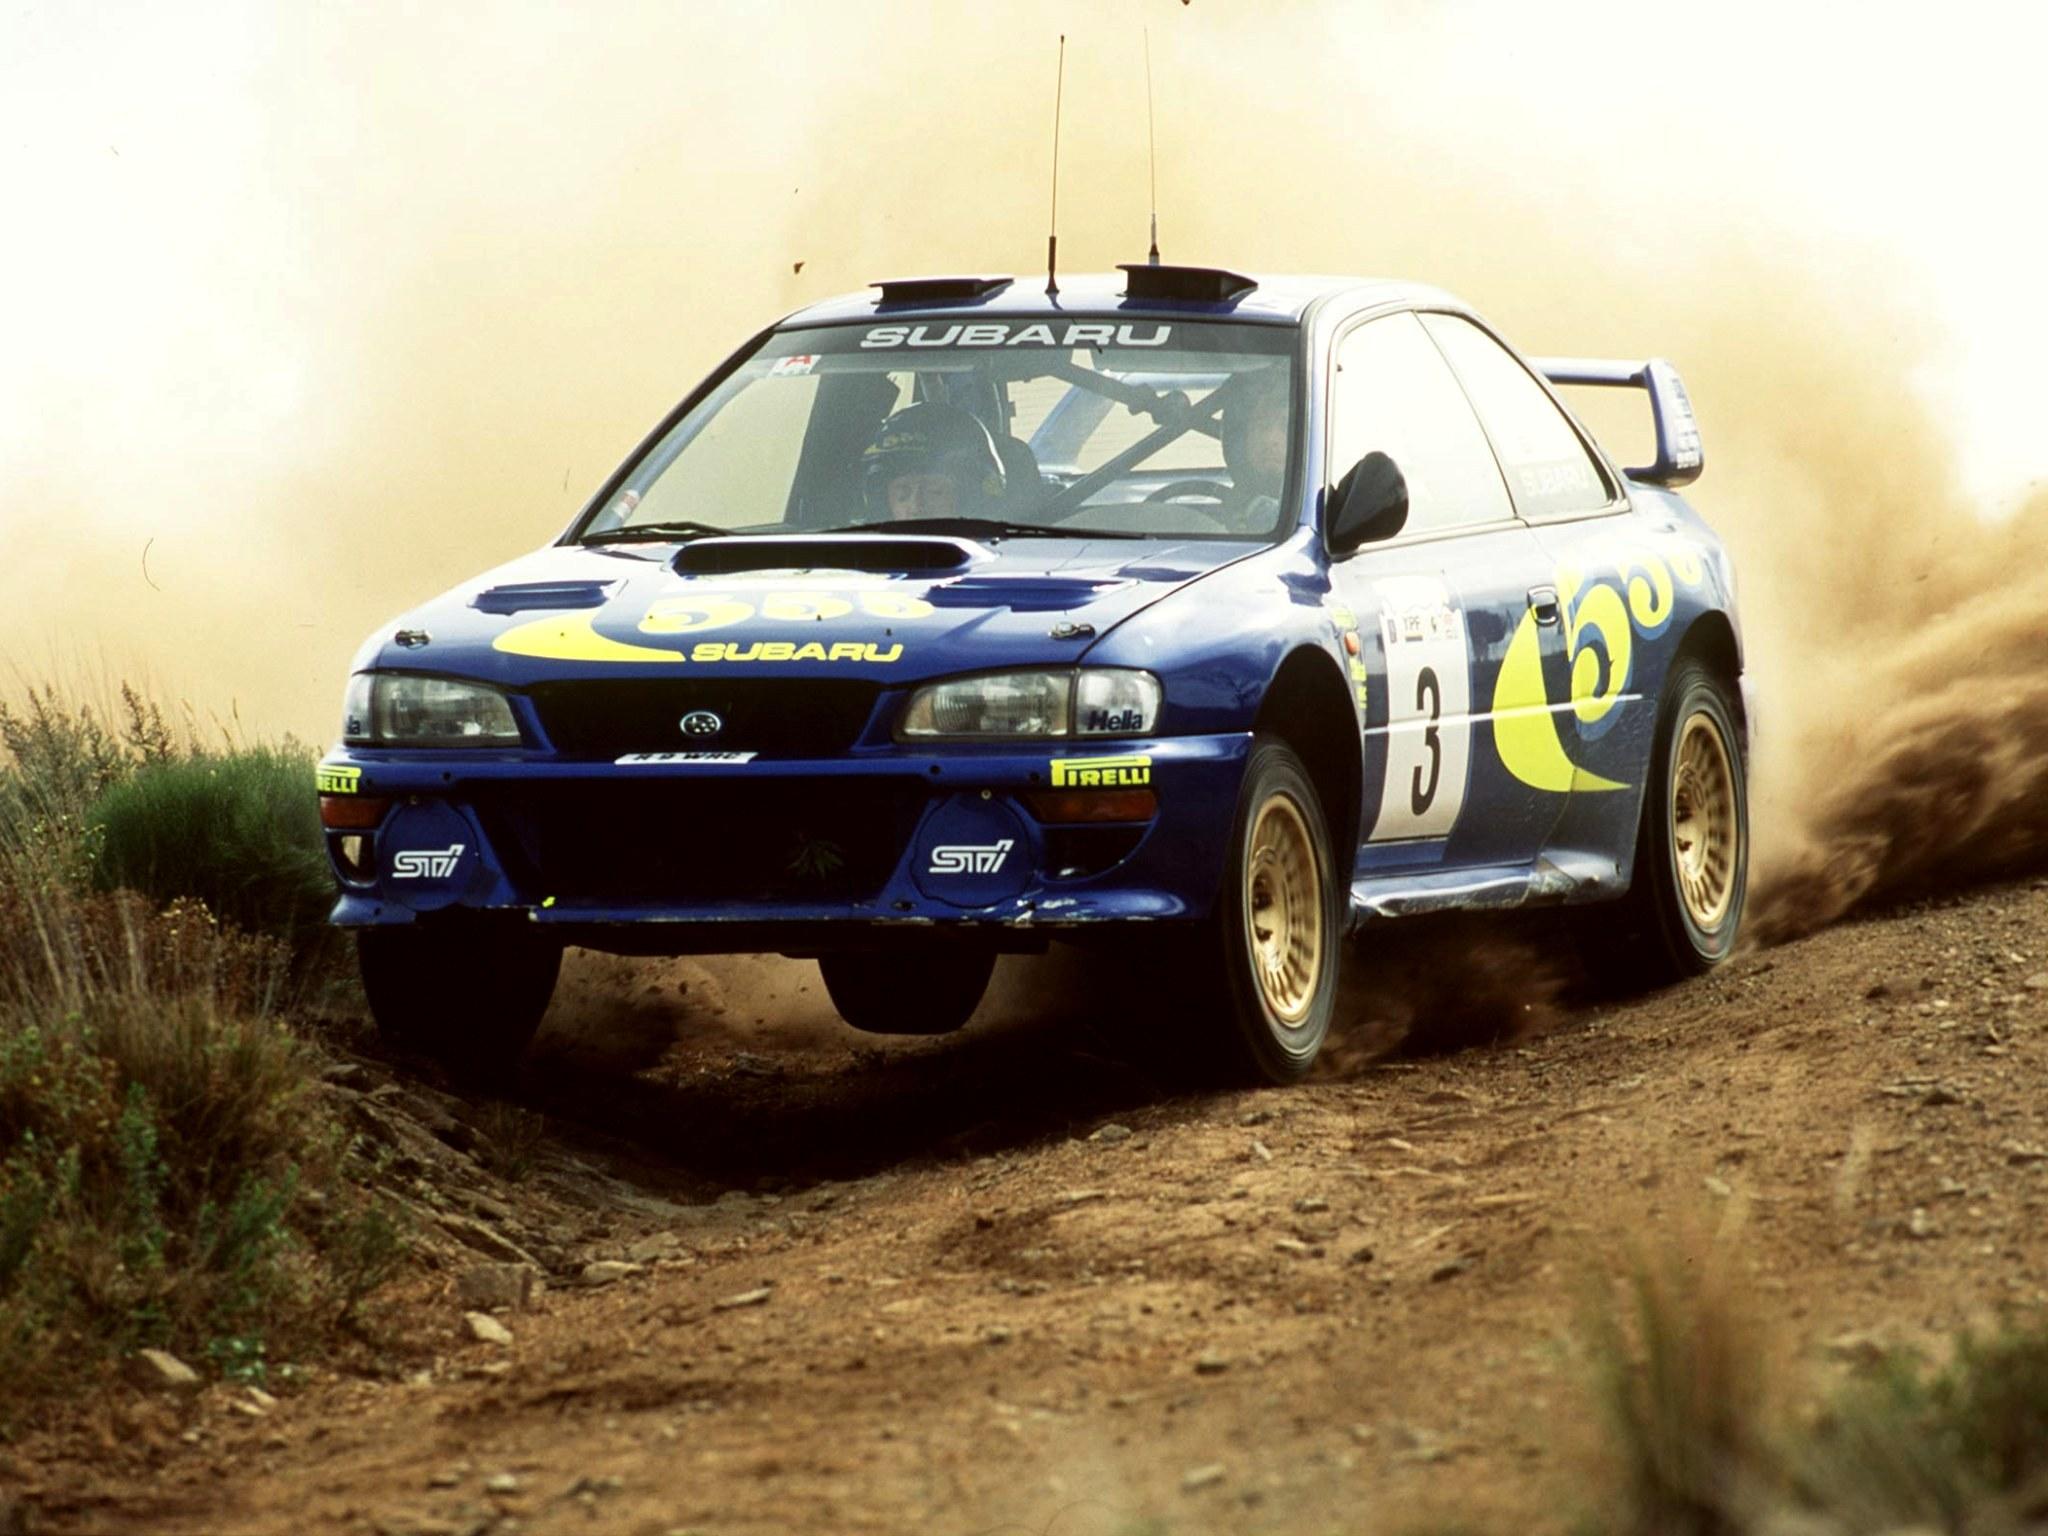 Subaru Impreza WRC photos - PhotoGallery with 38 pics| CarsBase.com